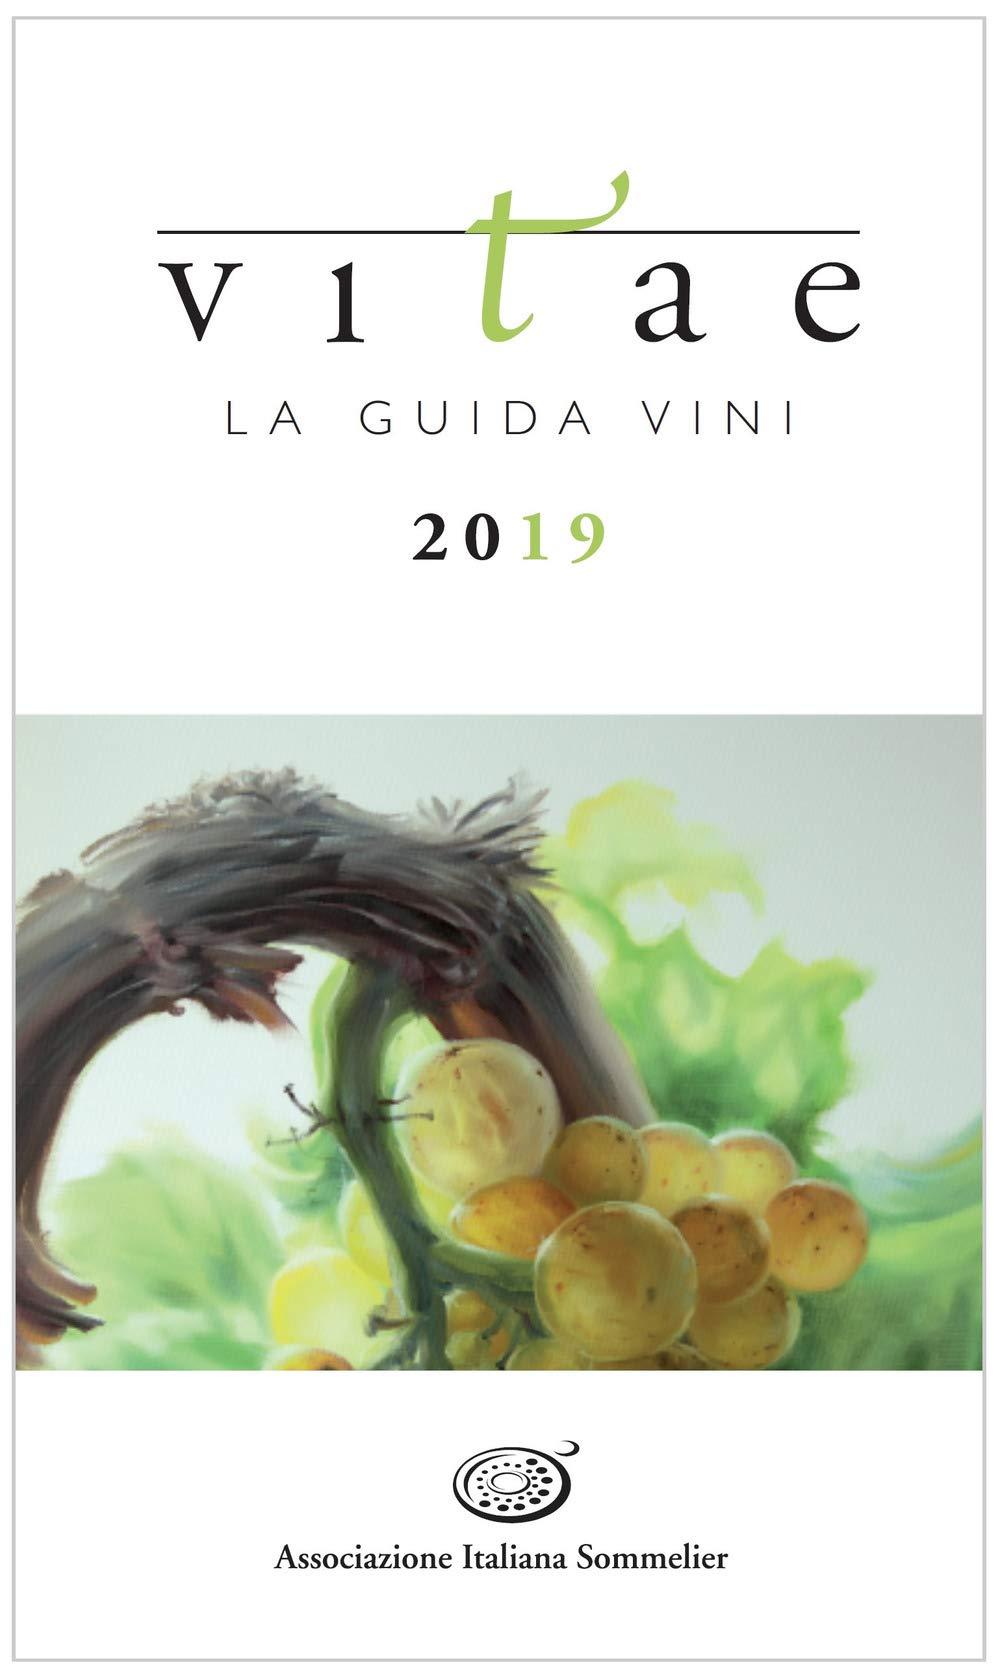 Vitae Guida Vini 2019 Associazione Italiana Sommelier